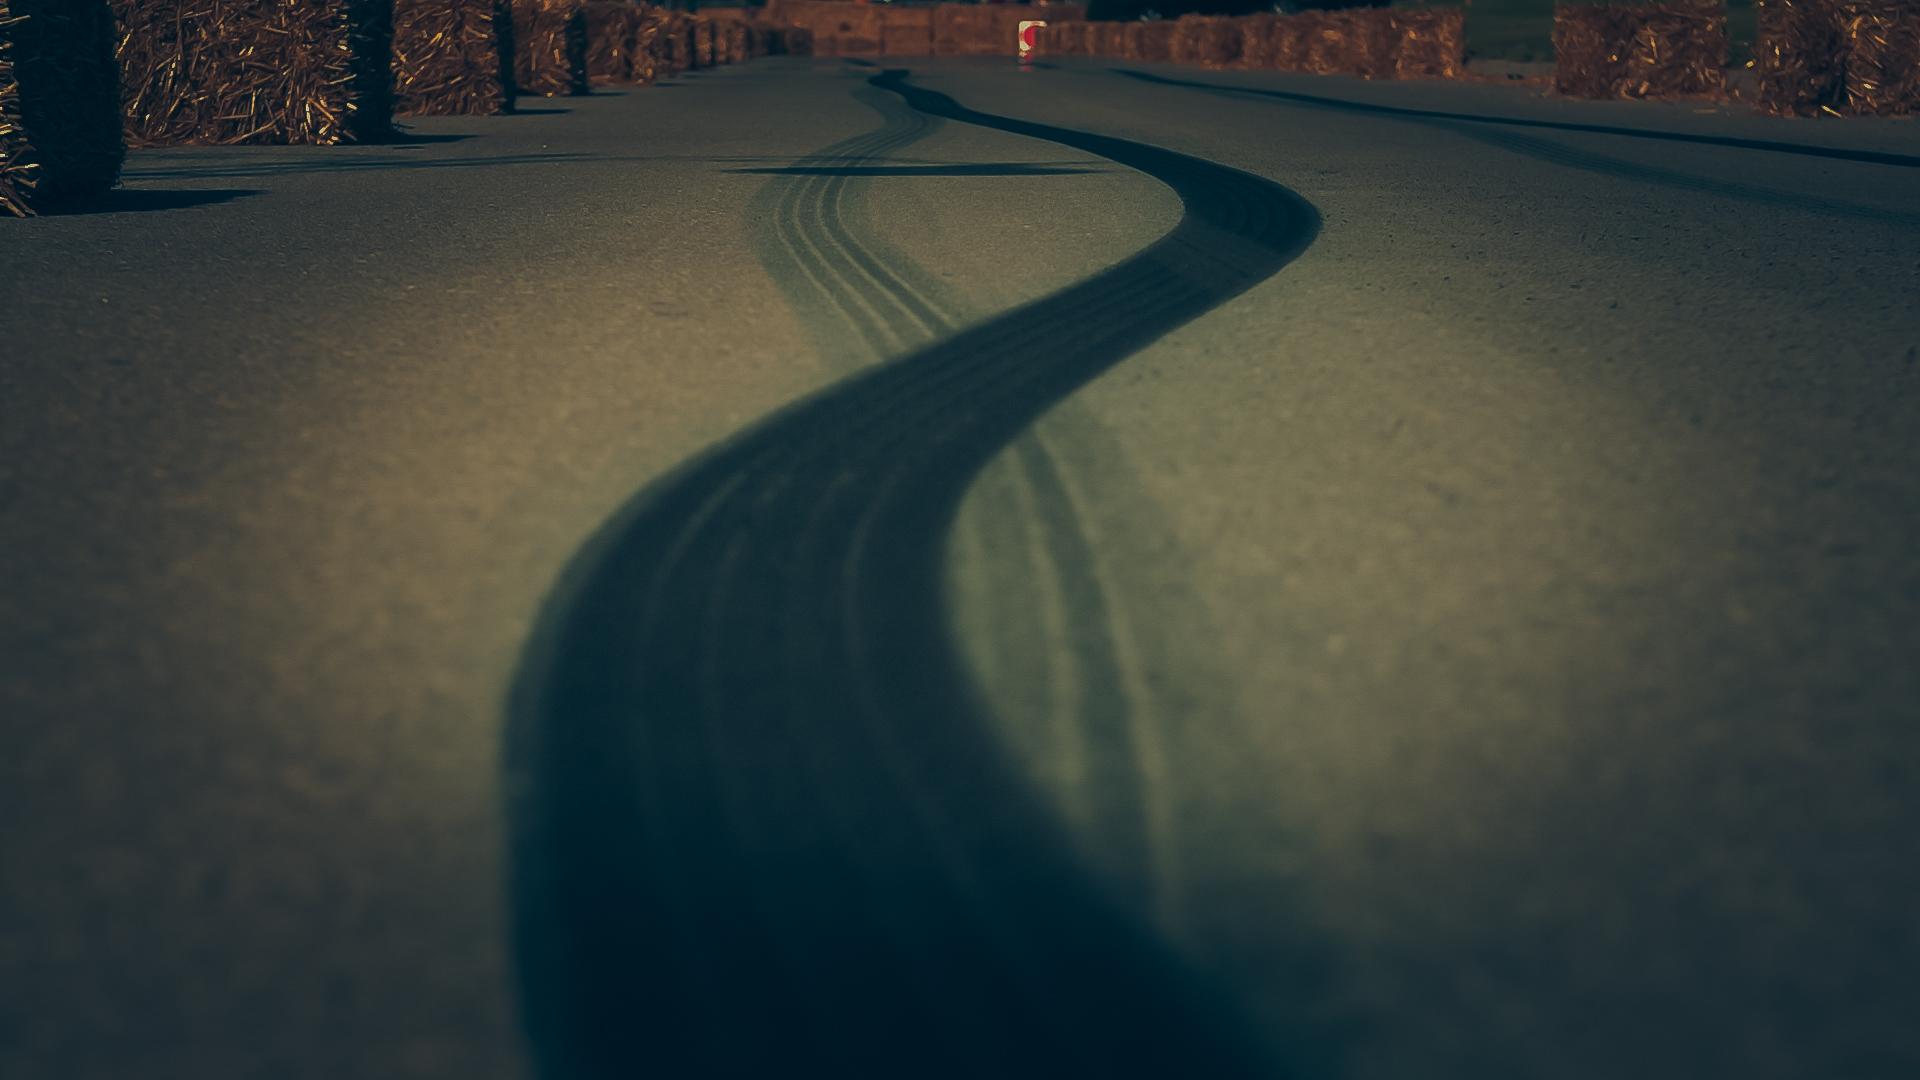 Speedparty_2016_AUTrenalinMEDIA-00-2.jpg